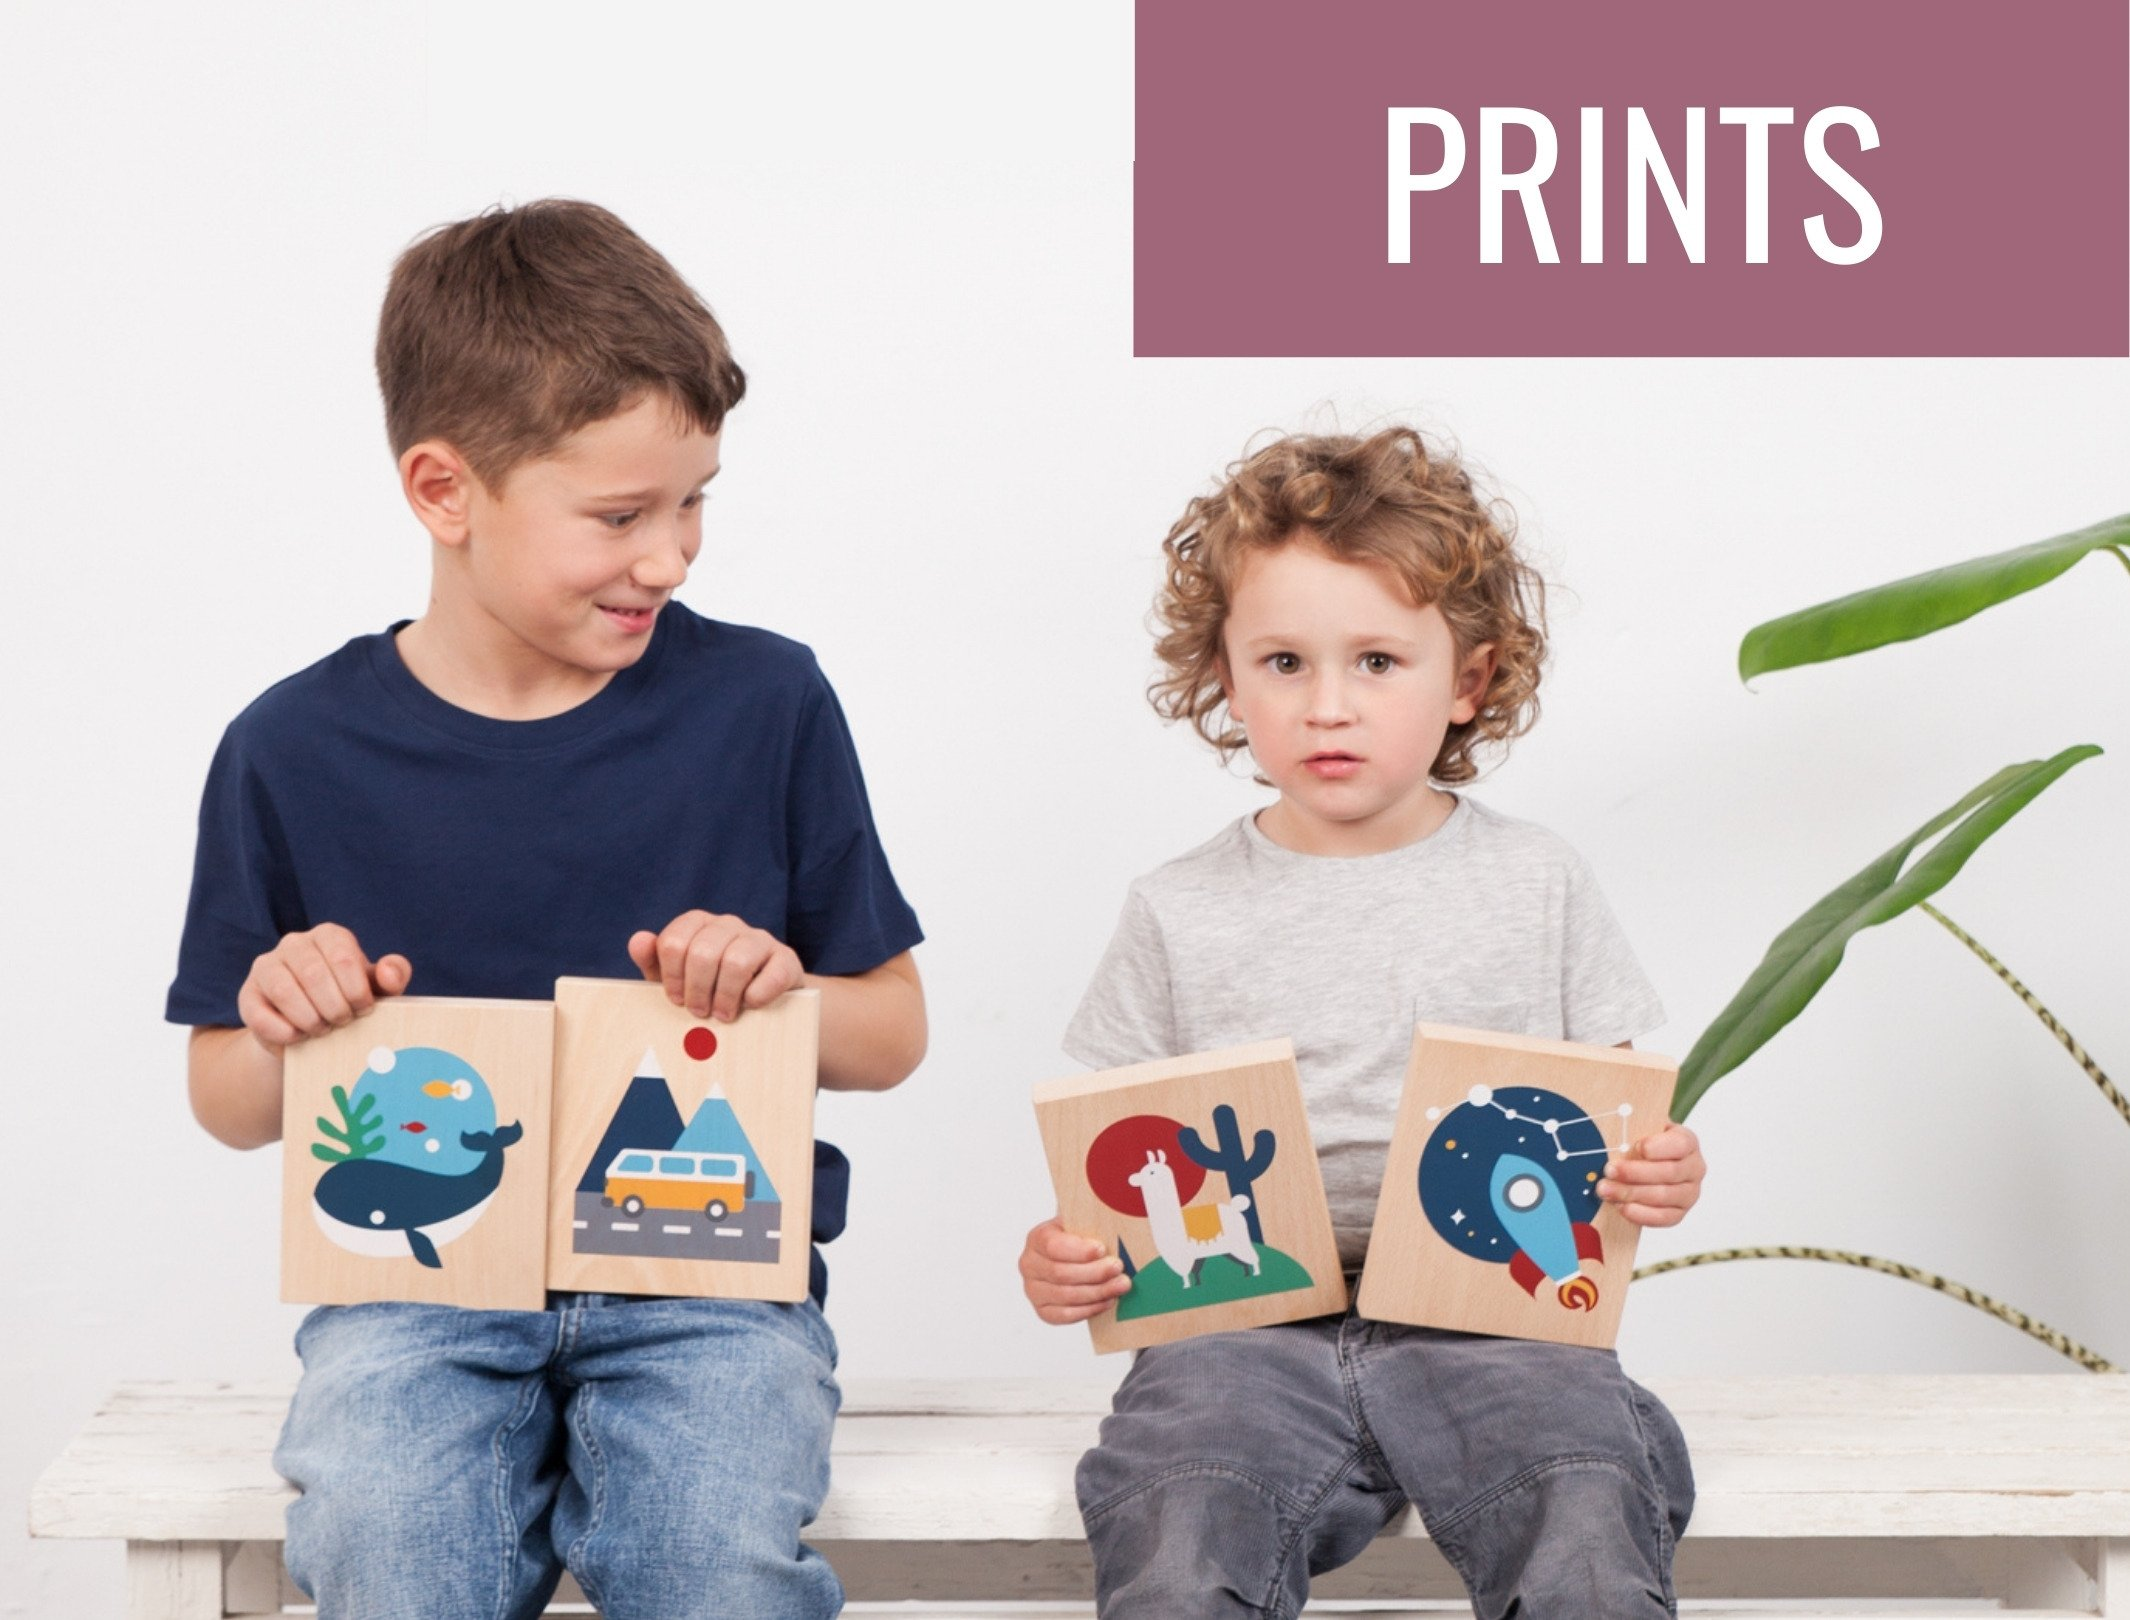 Lubulona wooden prints